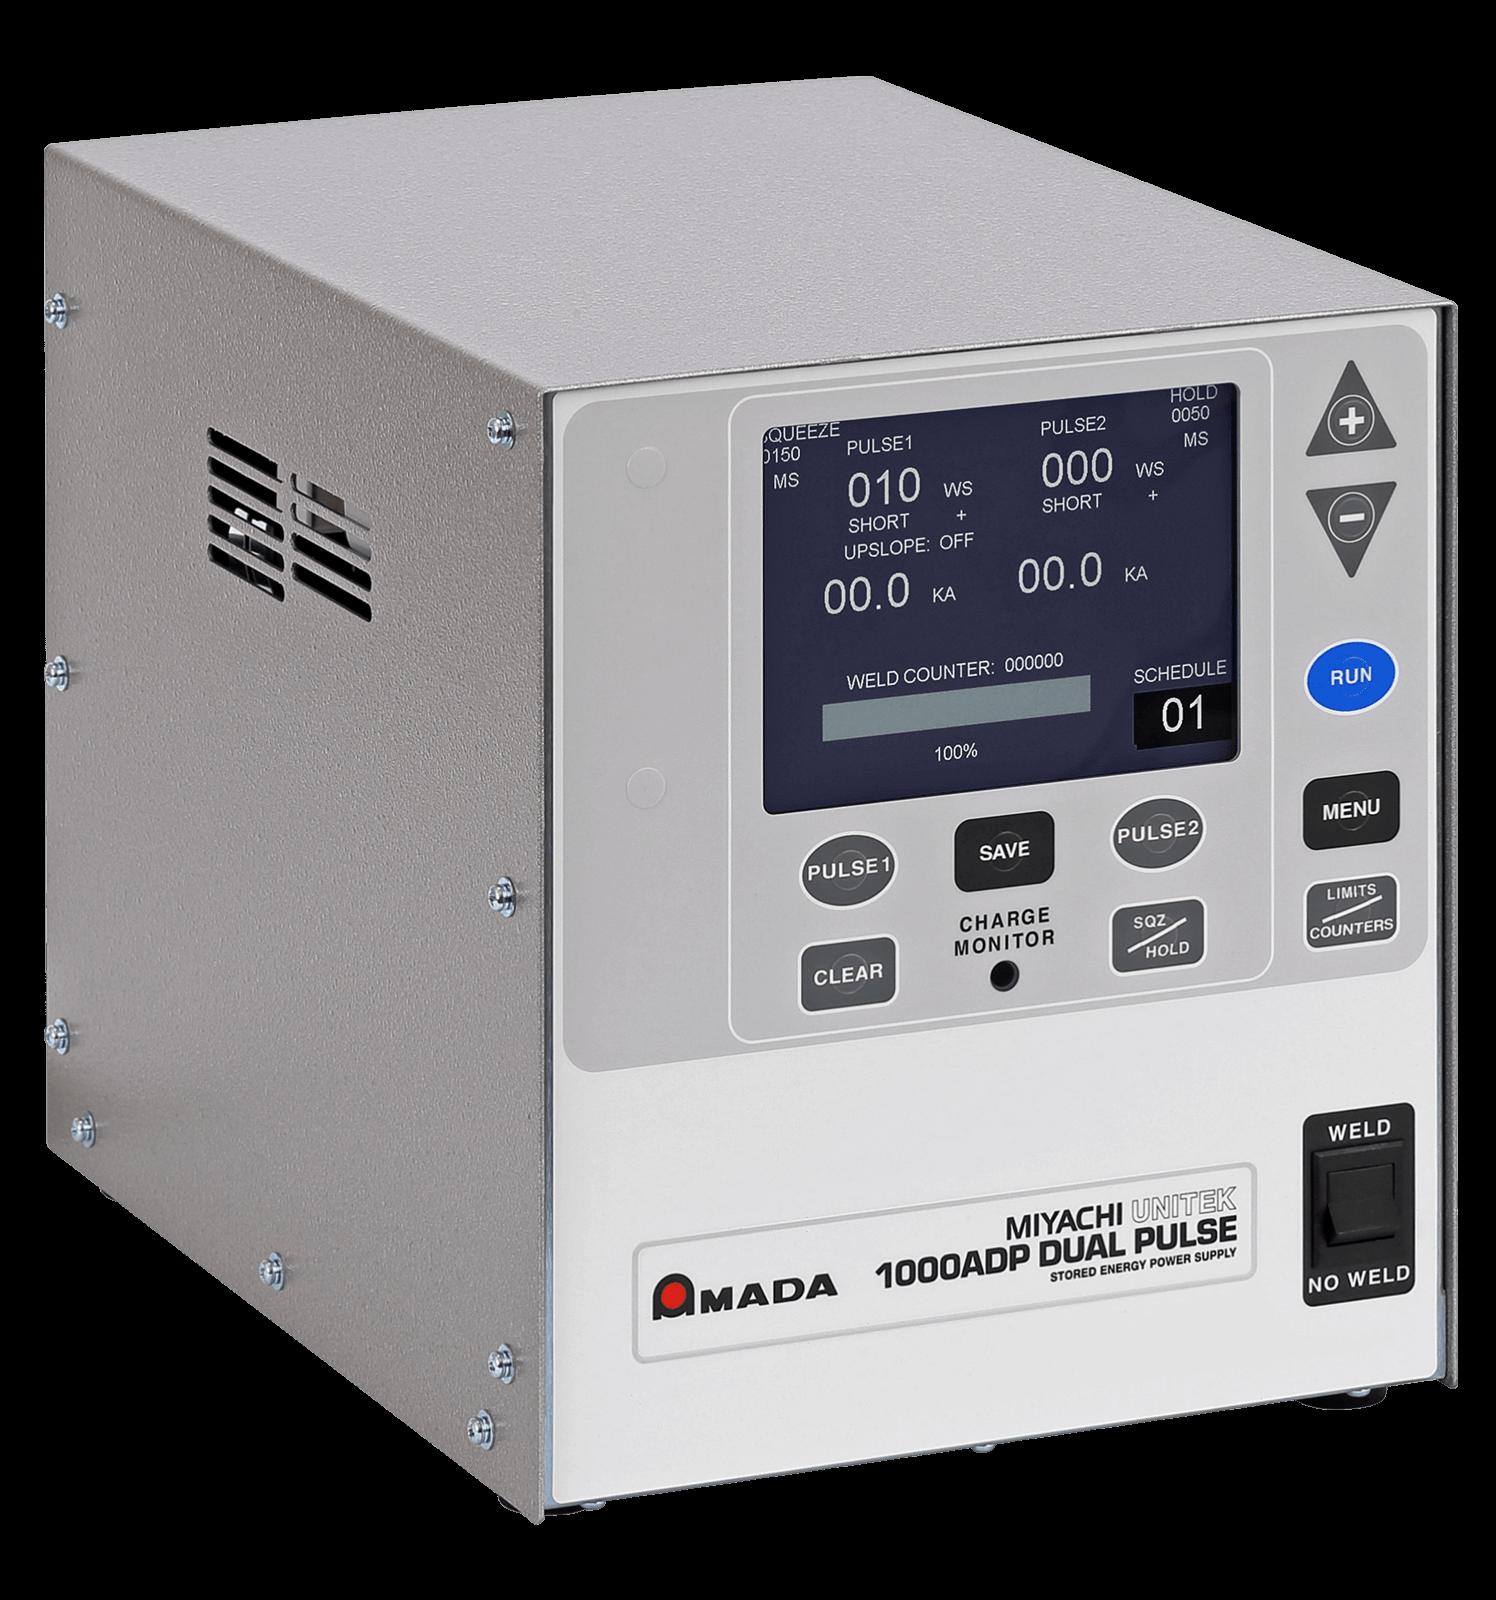 1000ADP Dual Pulse Capacitive Discharge Welder